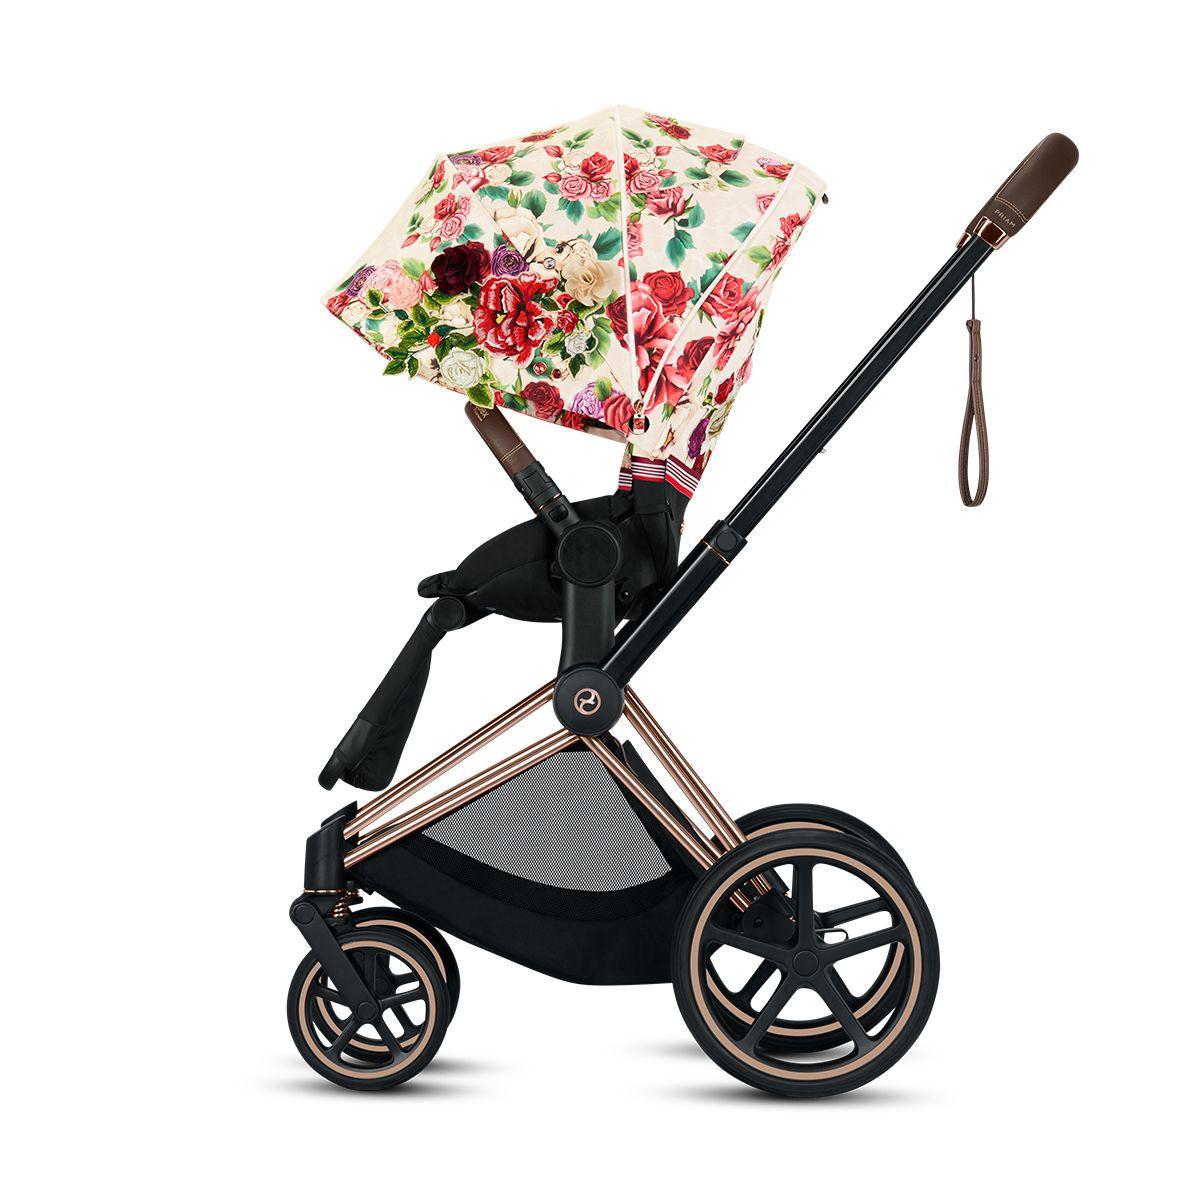 Cybex Platinum Priam Stroller Light Spring Blossom in